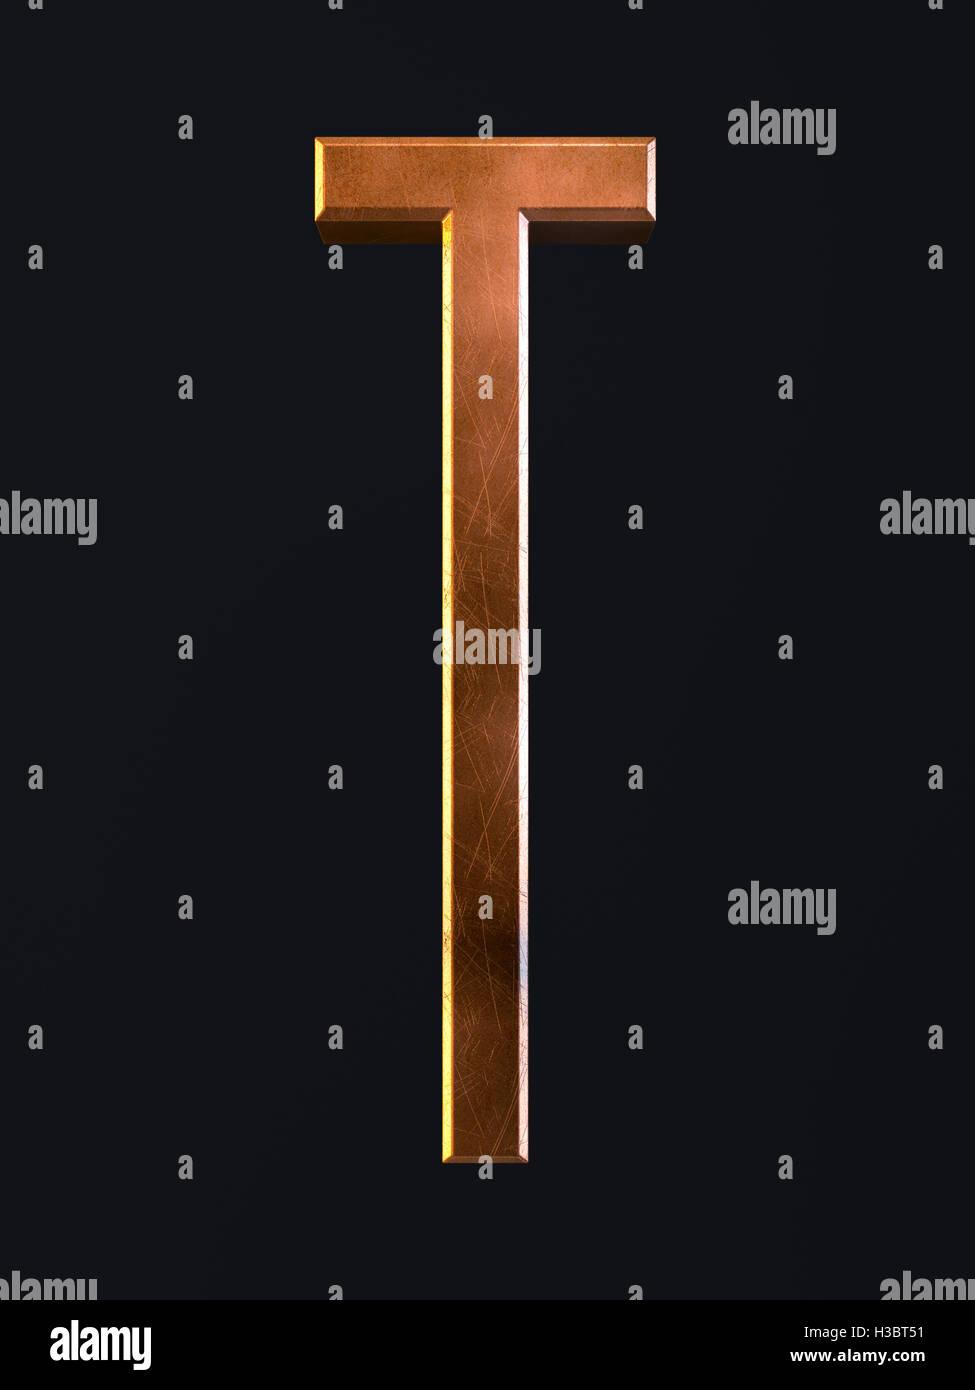 3d Render Of Golden Metal Dirty Rust Scratch Alphabet Letter Symbol